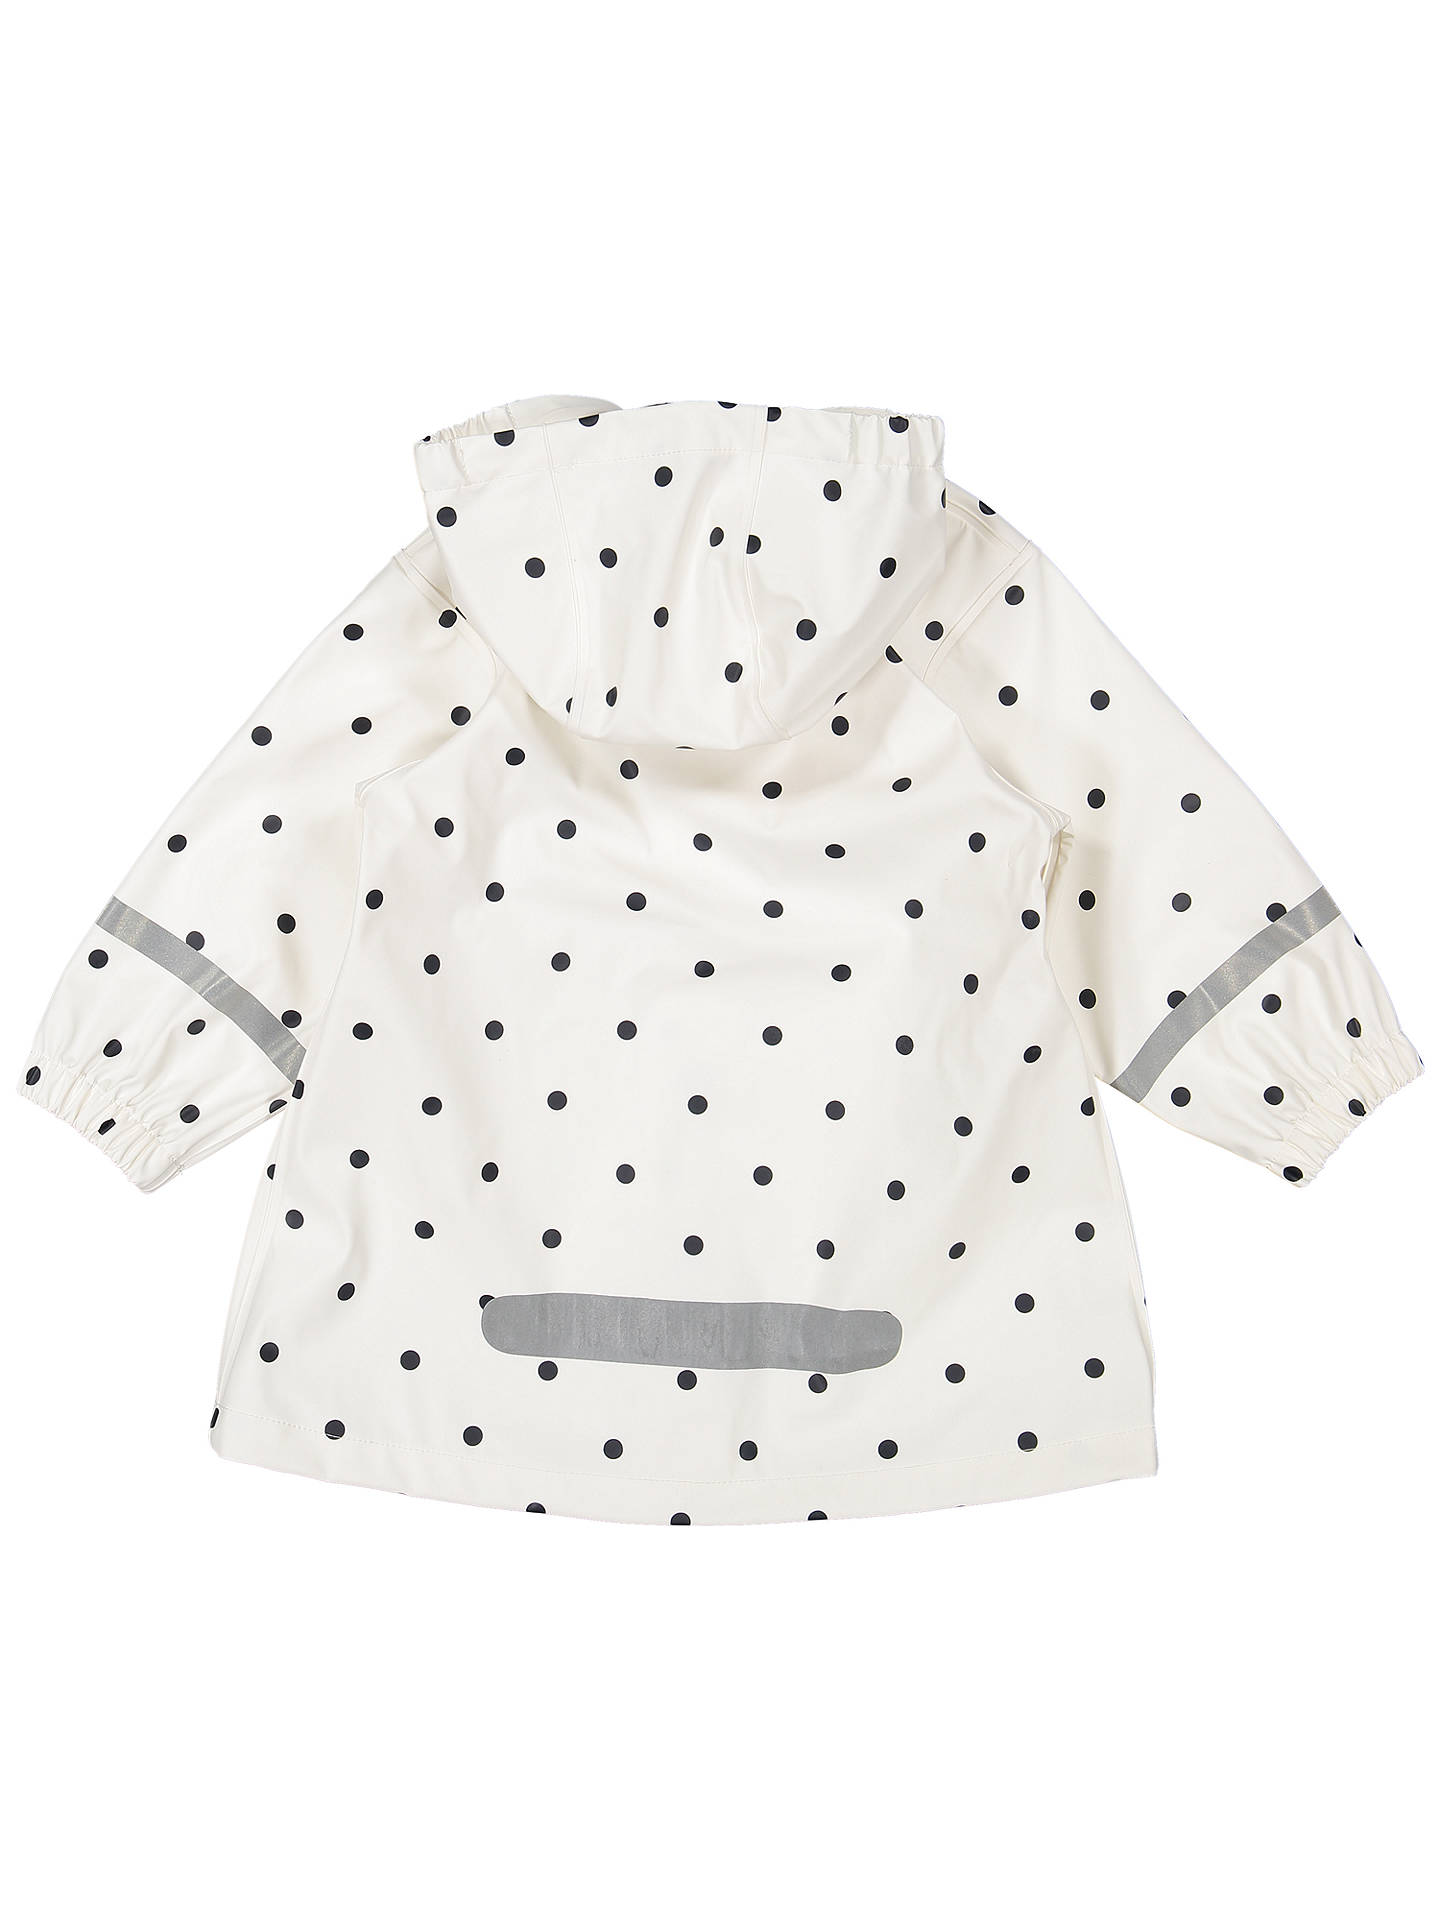 3ad9ee6a5 Polarn O. Pyret Baby Polka Dot Raincoat